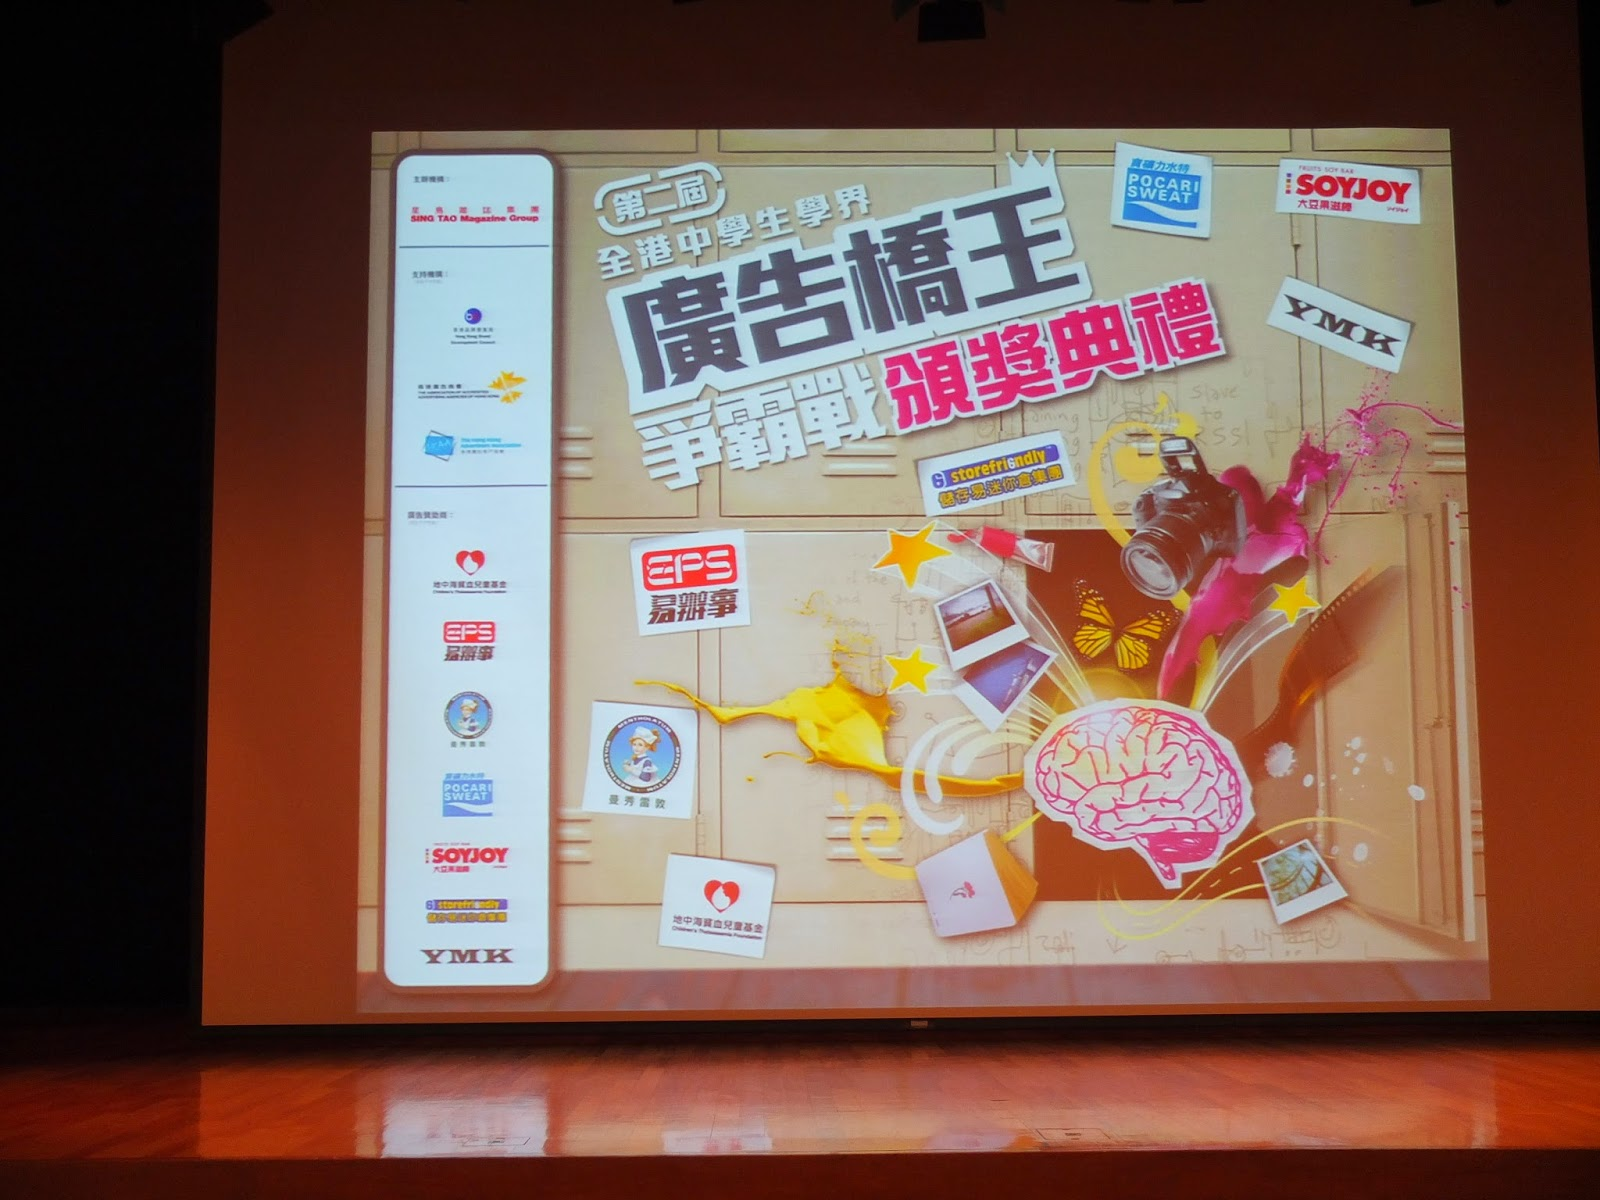 儲存易迷你倉集團 Storefriendly Self Storage Group Blog [No.1 Self Storage in Asia]: 2014/7/1 - 2014/8/1